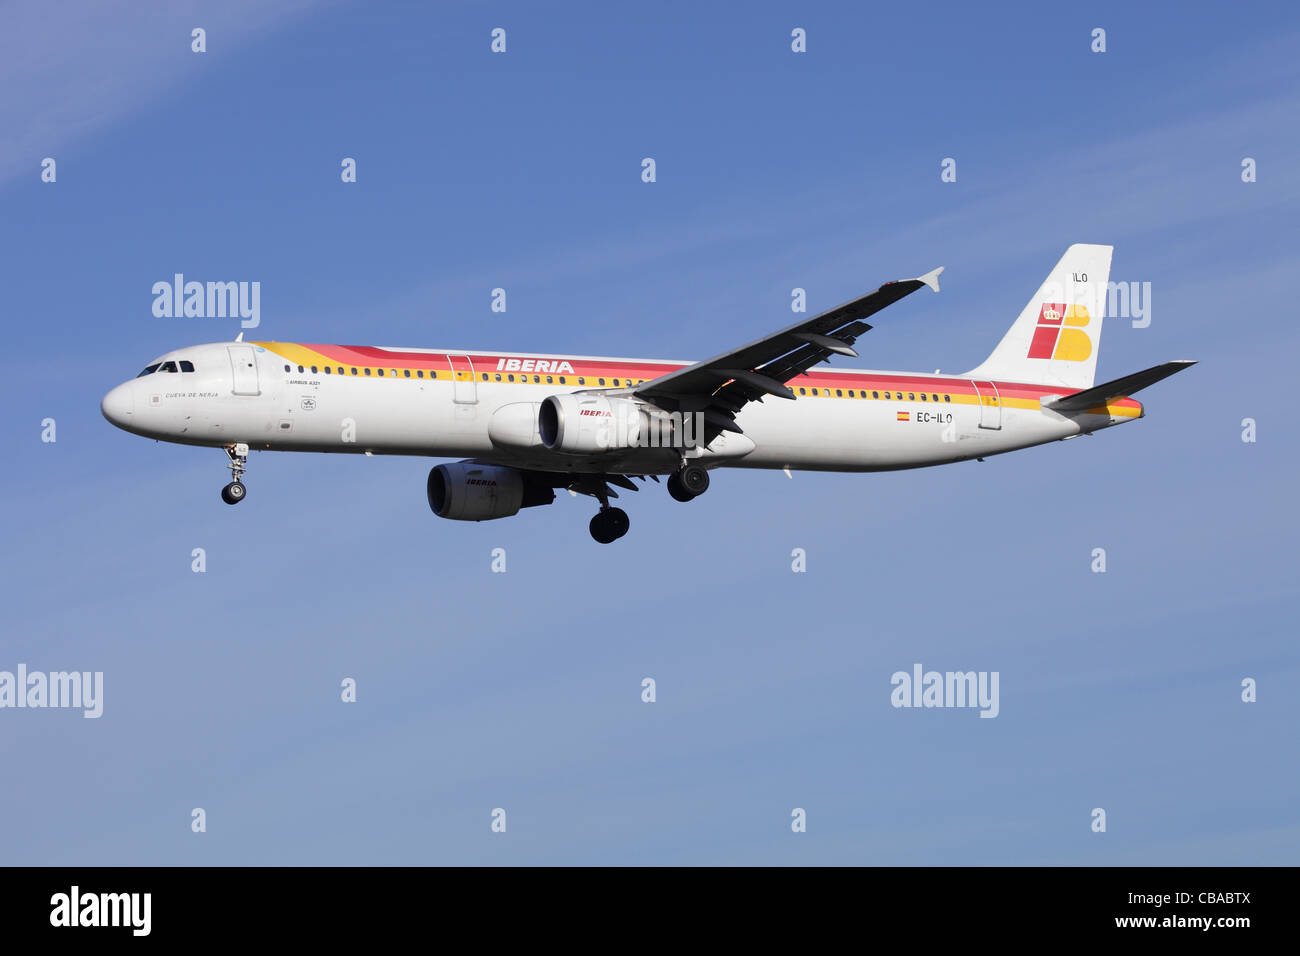 Iberia Airbus A321-211 EC-ILO on approach to Heathrow - Stock Image